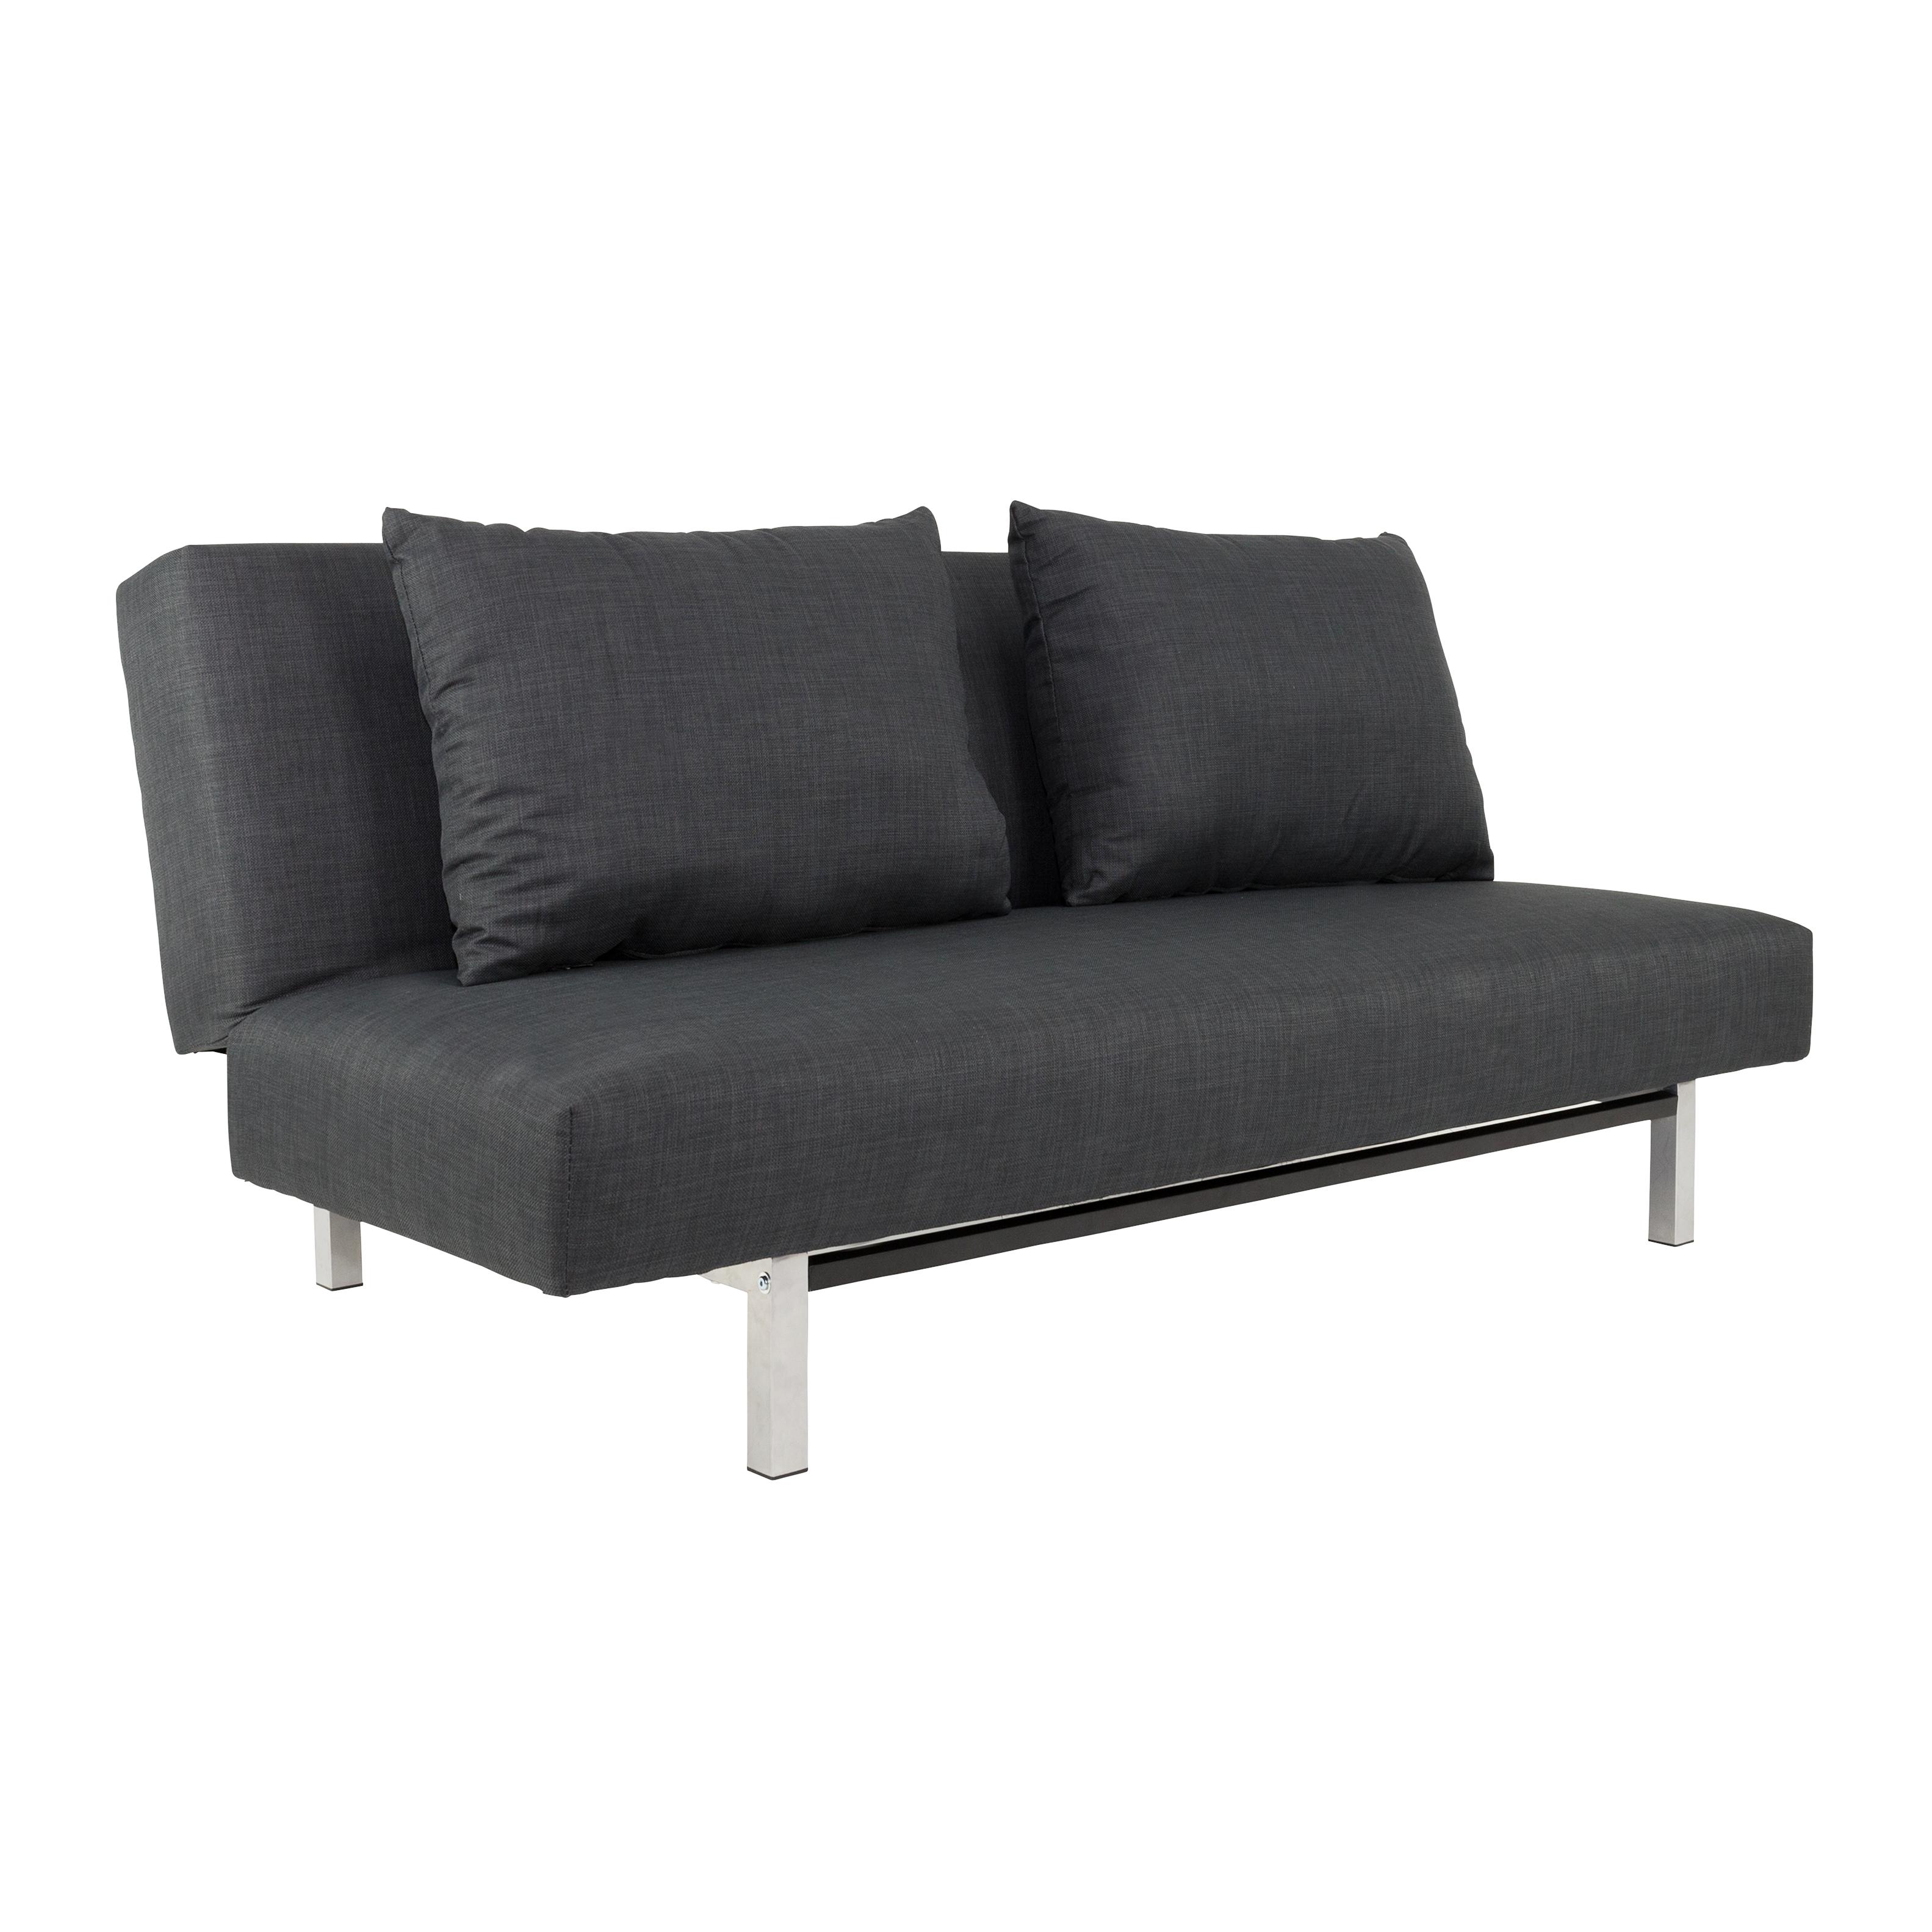 Buy Sofa Bed Online Get Home Inteiror House Design Inspiration